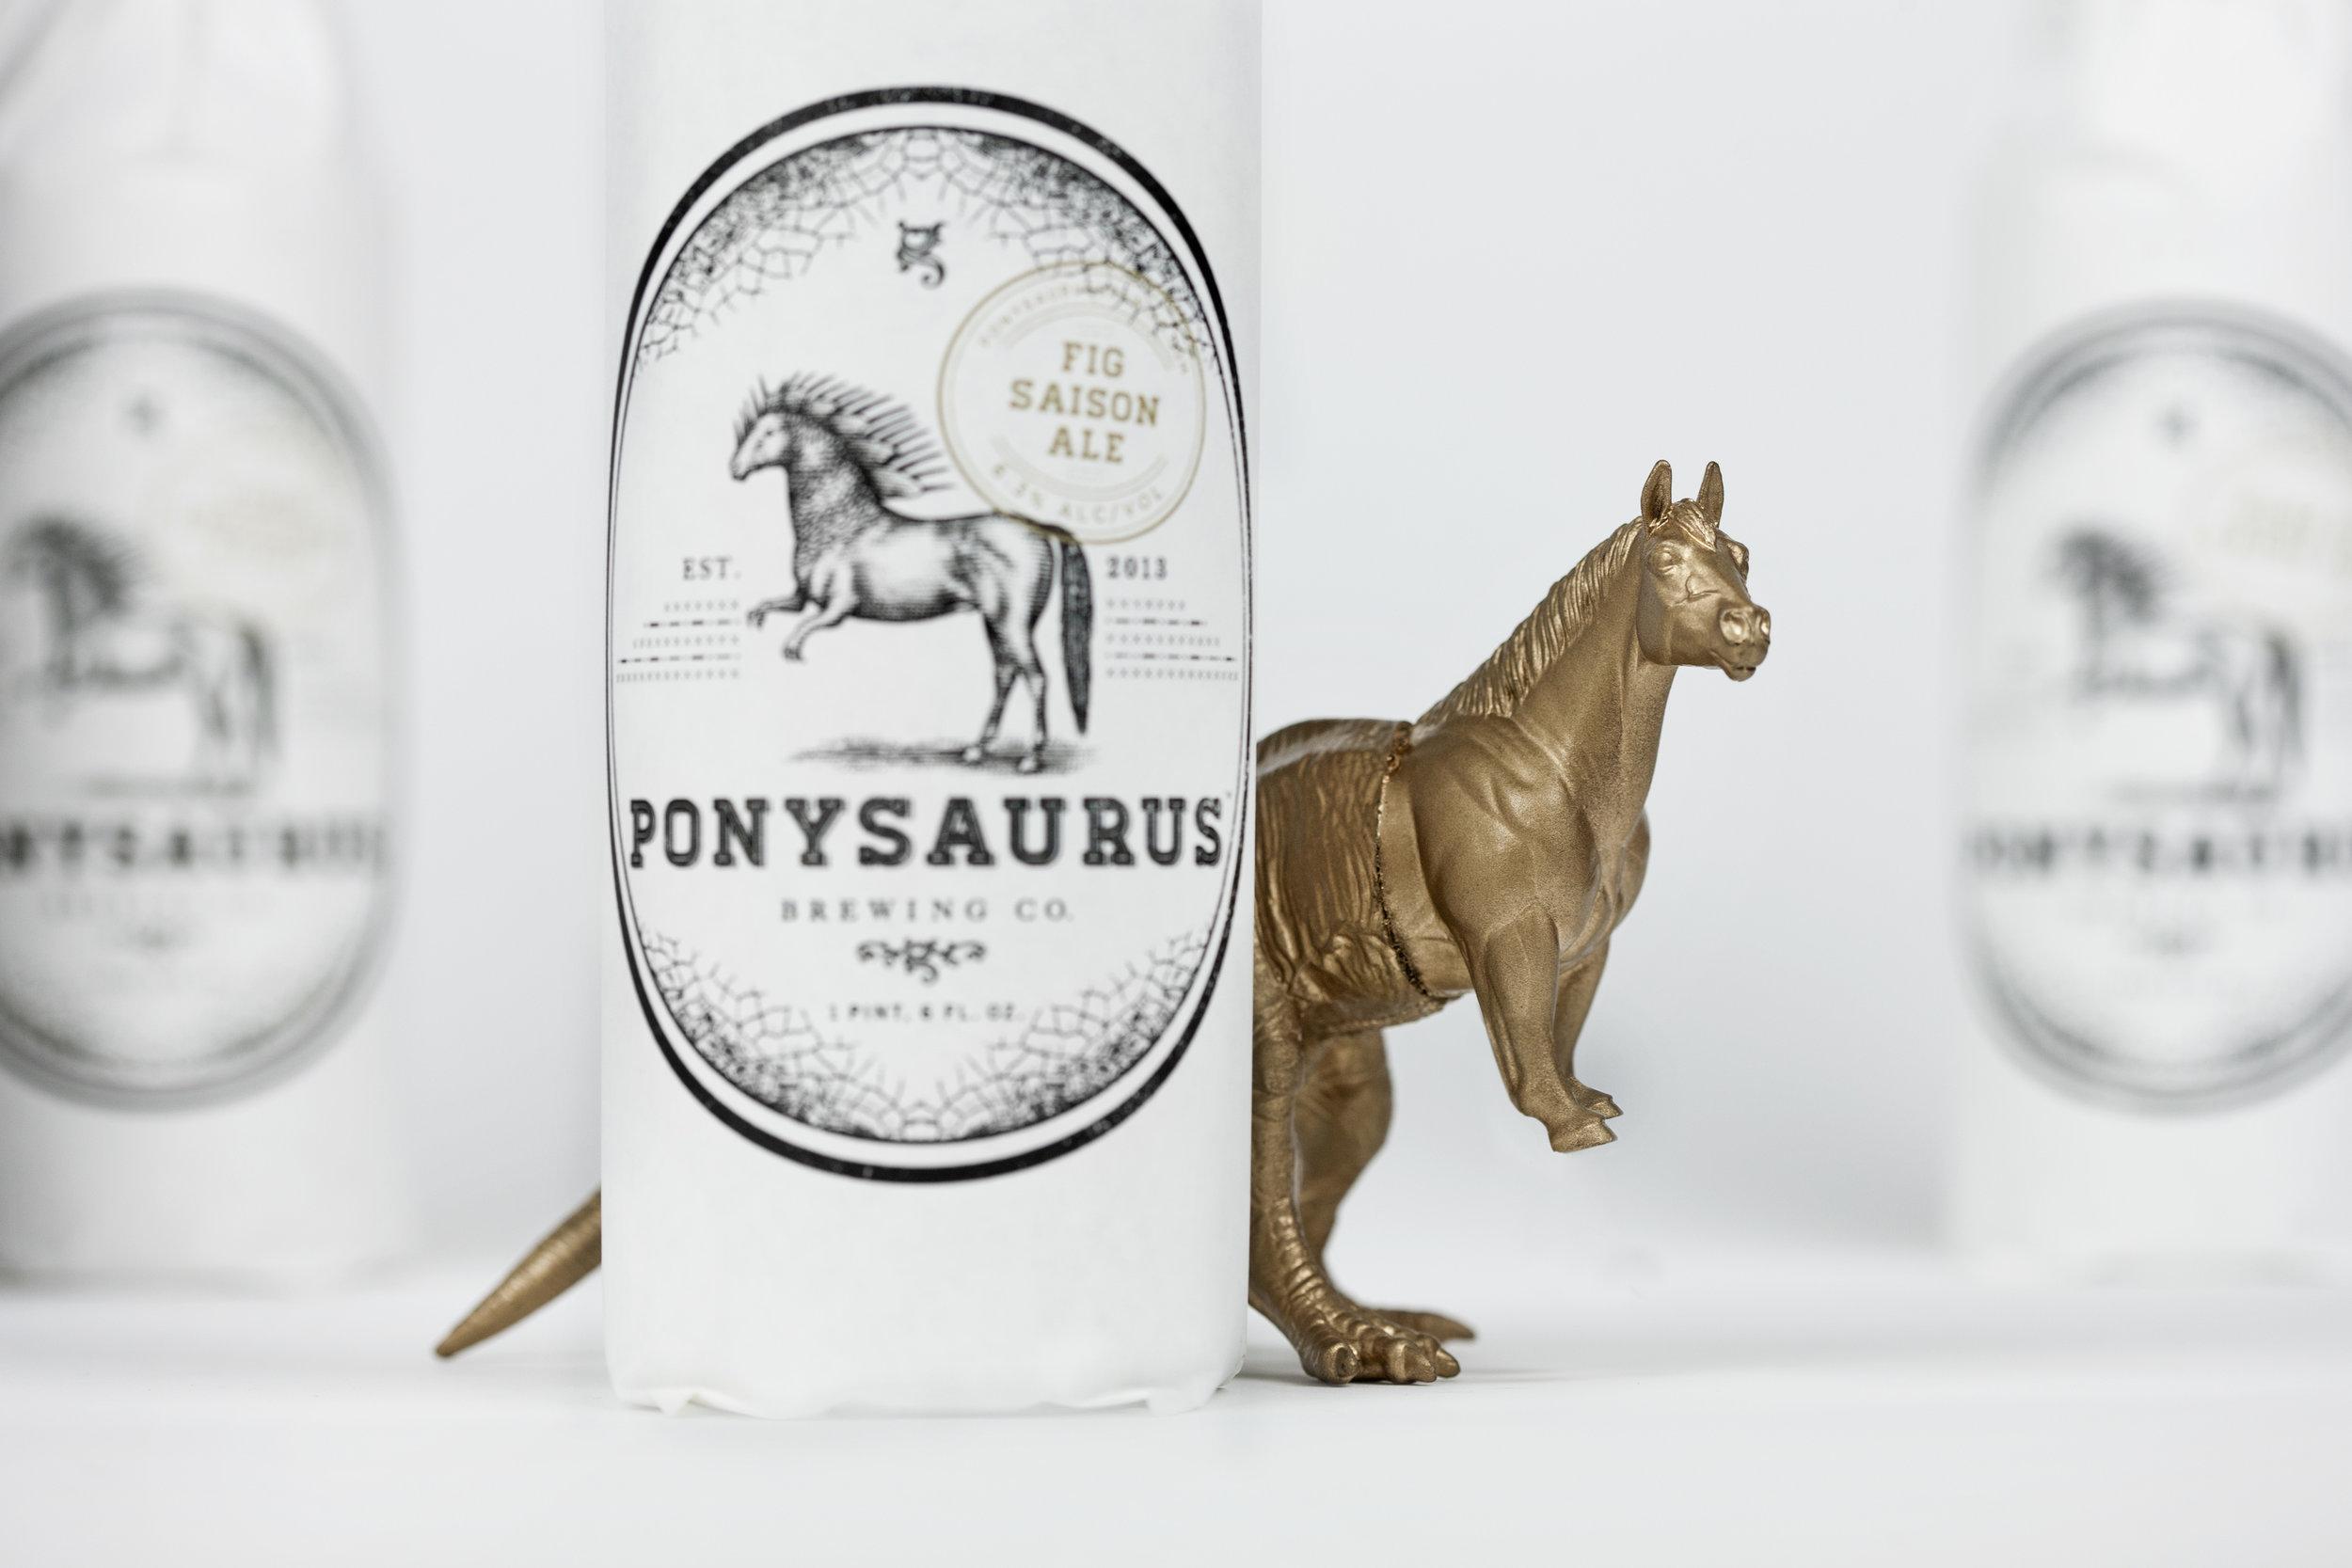 PONYSAURUS_FIGURE.jpg